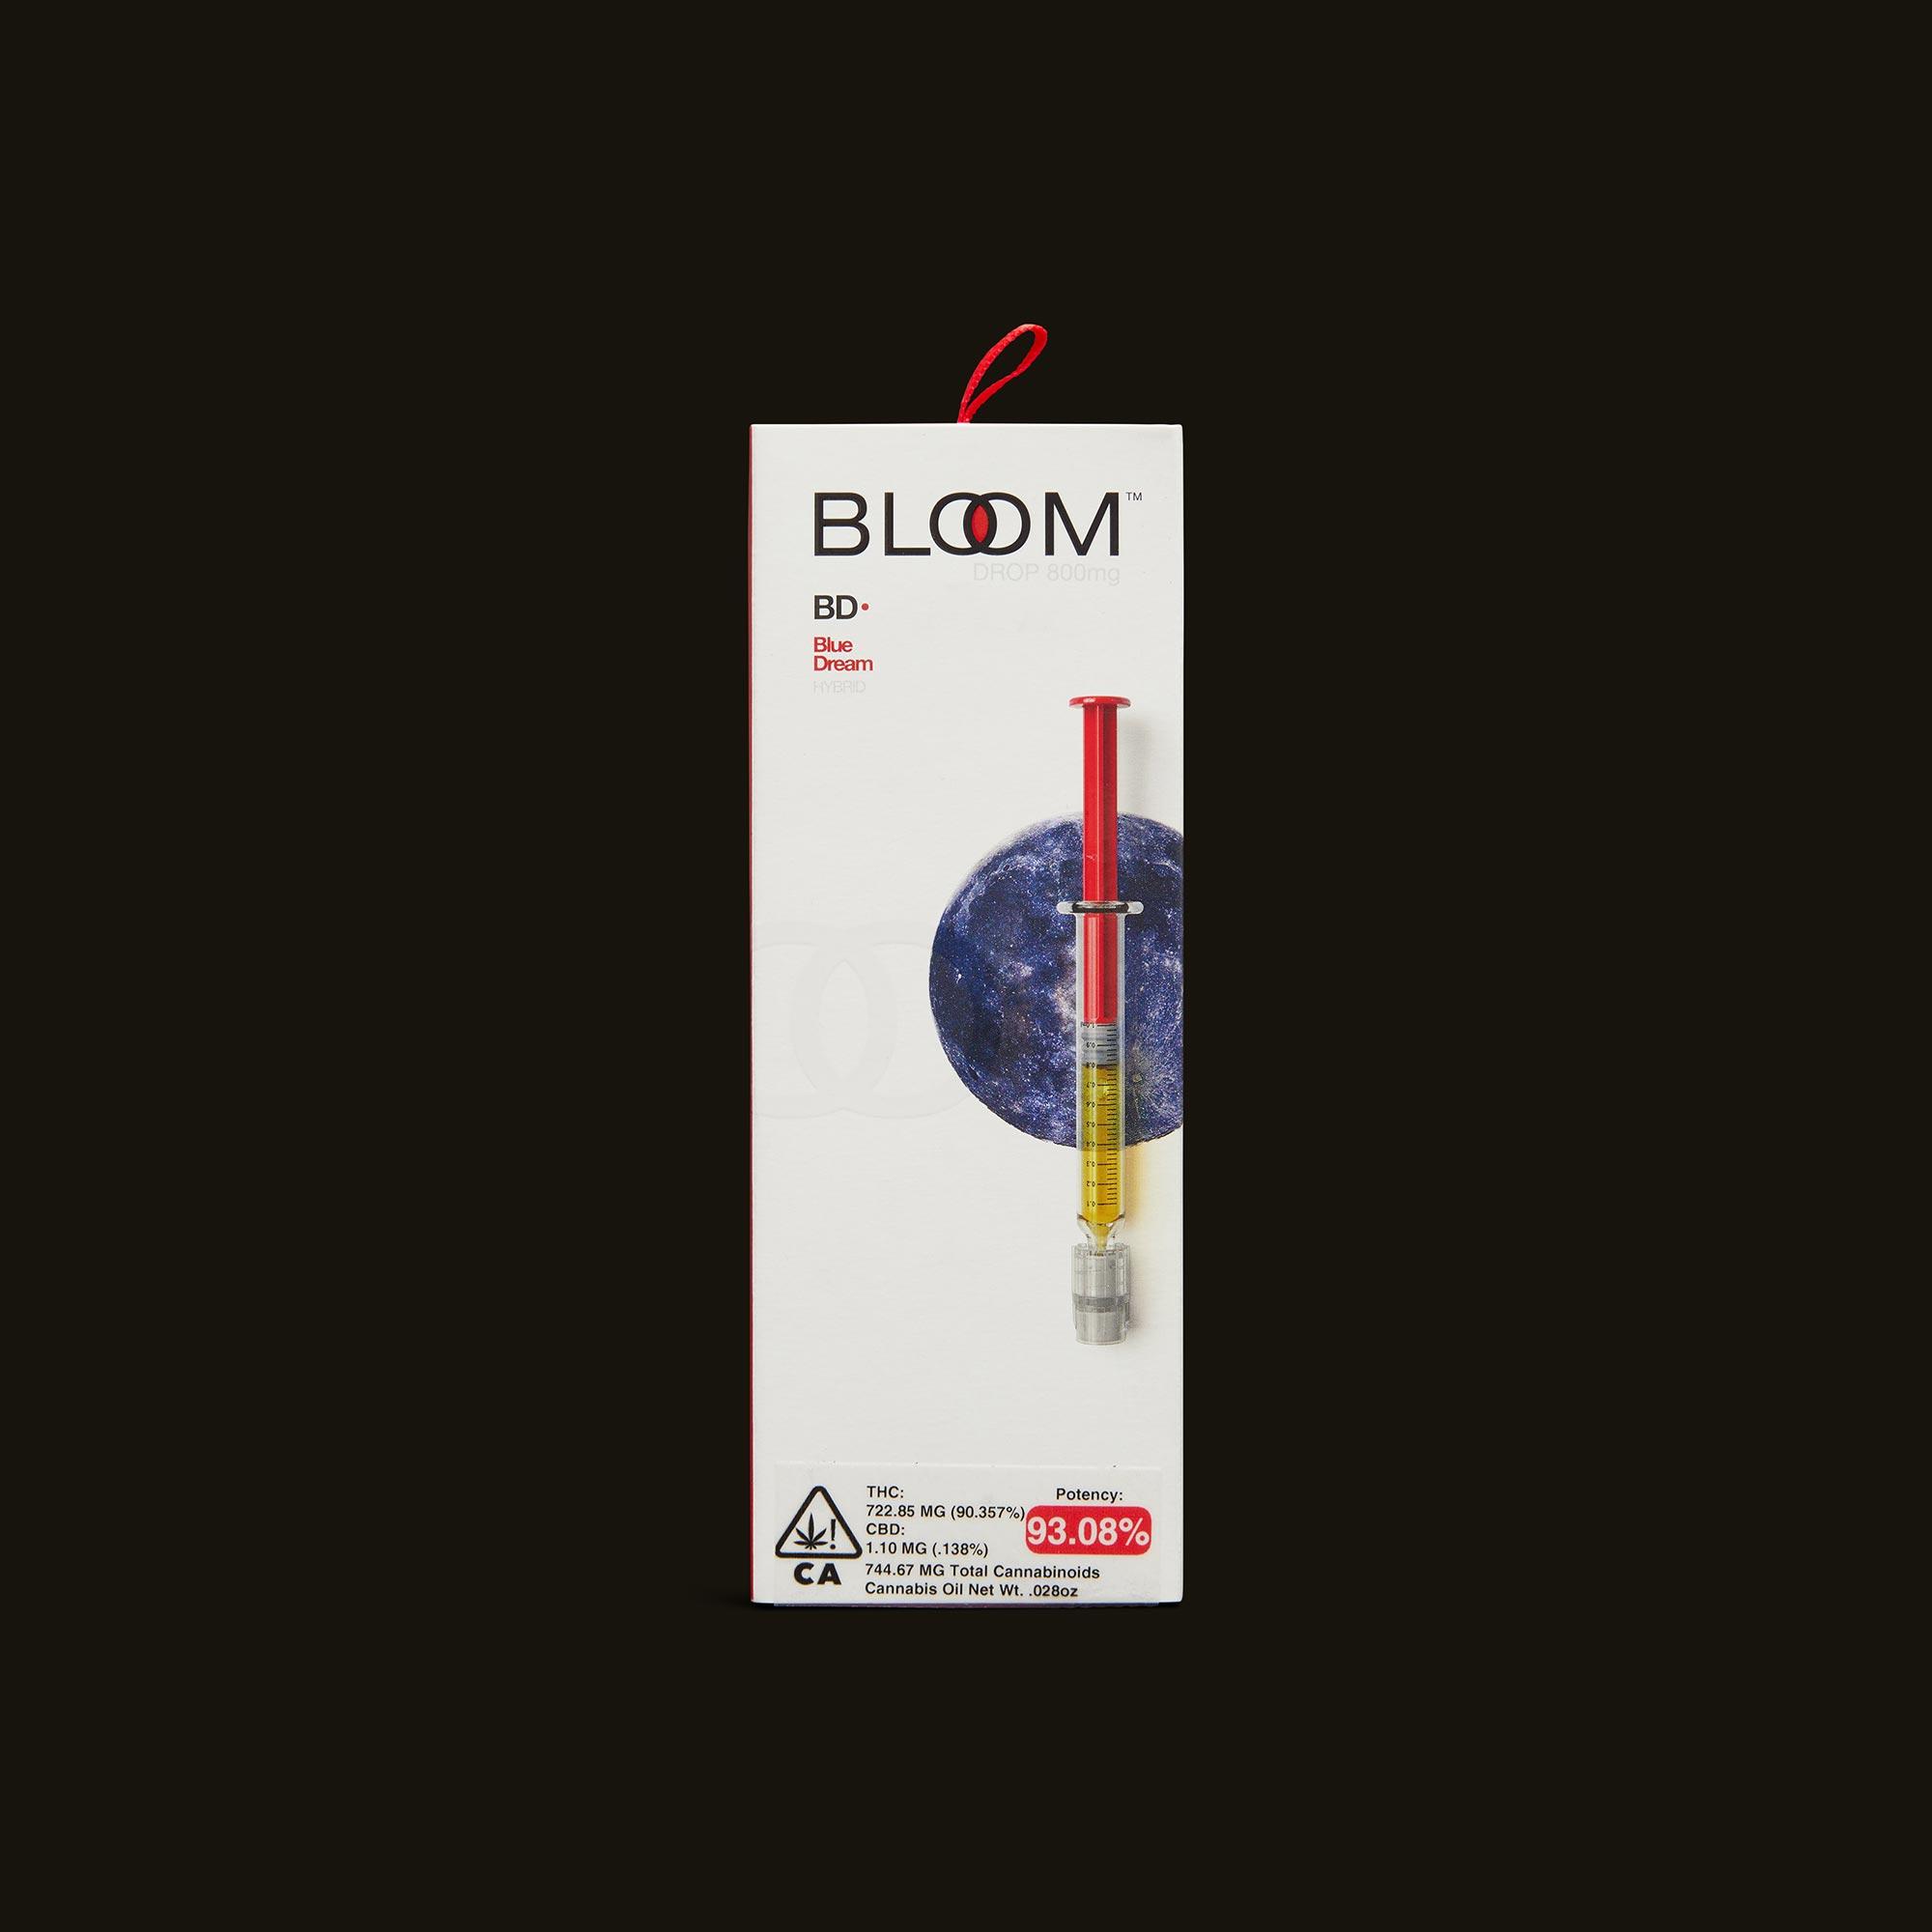 Blue Dream Drop - One 800mg syringe